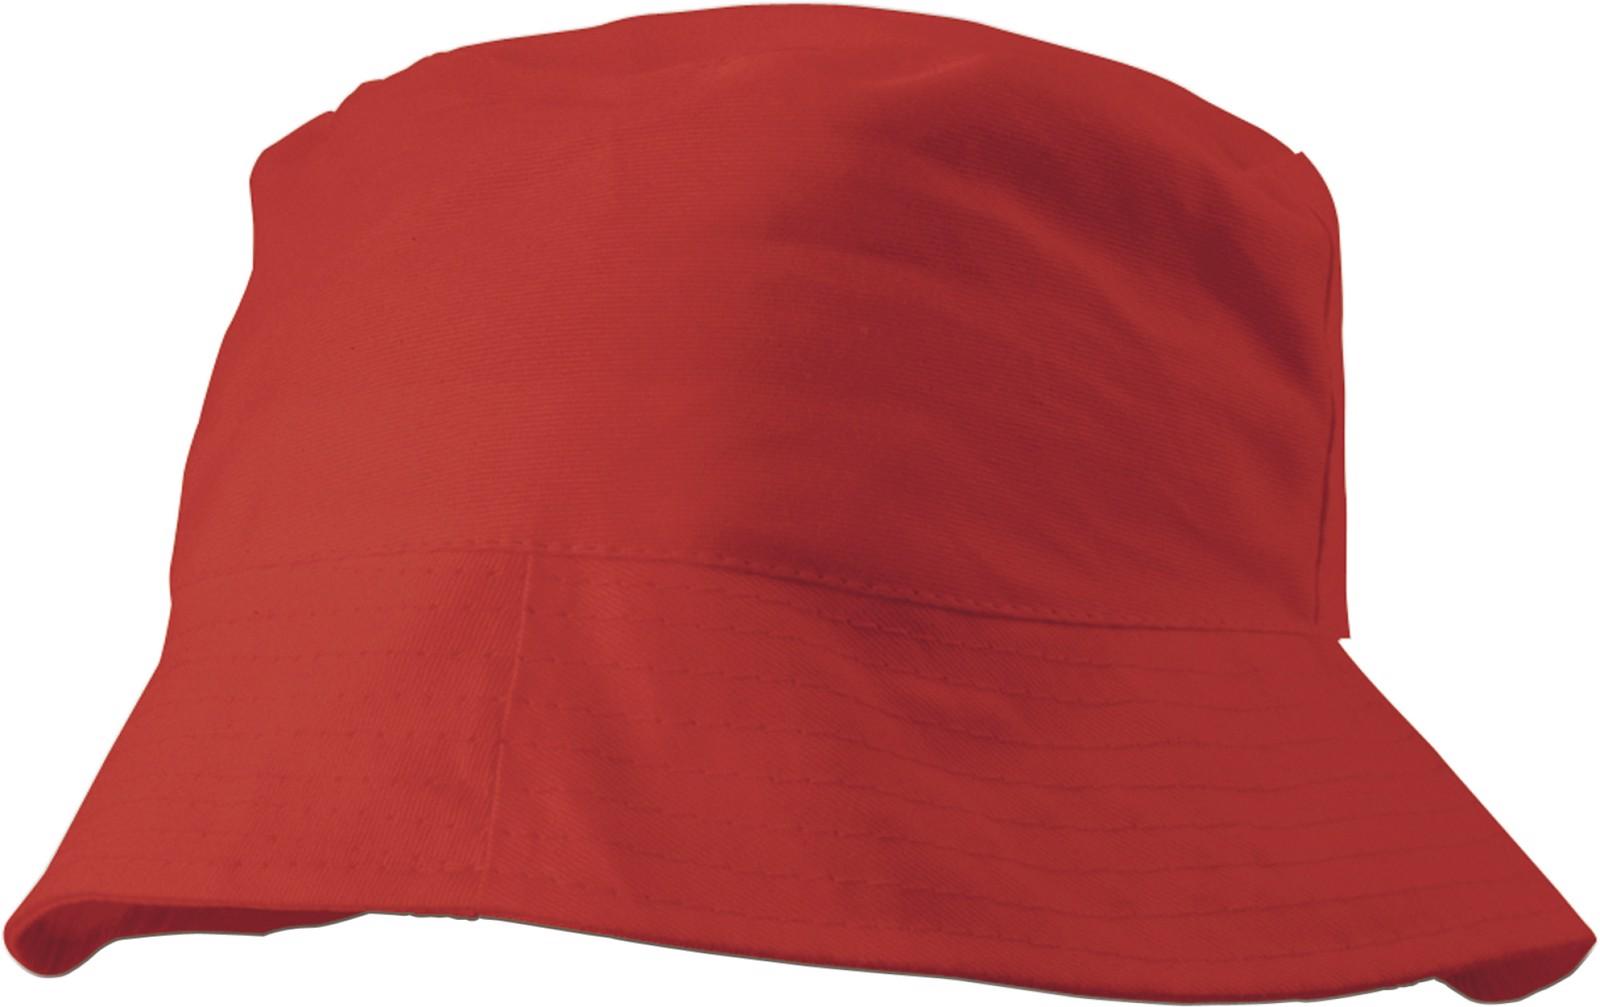 Cotton sun hat - Red